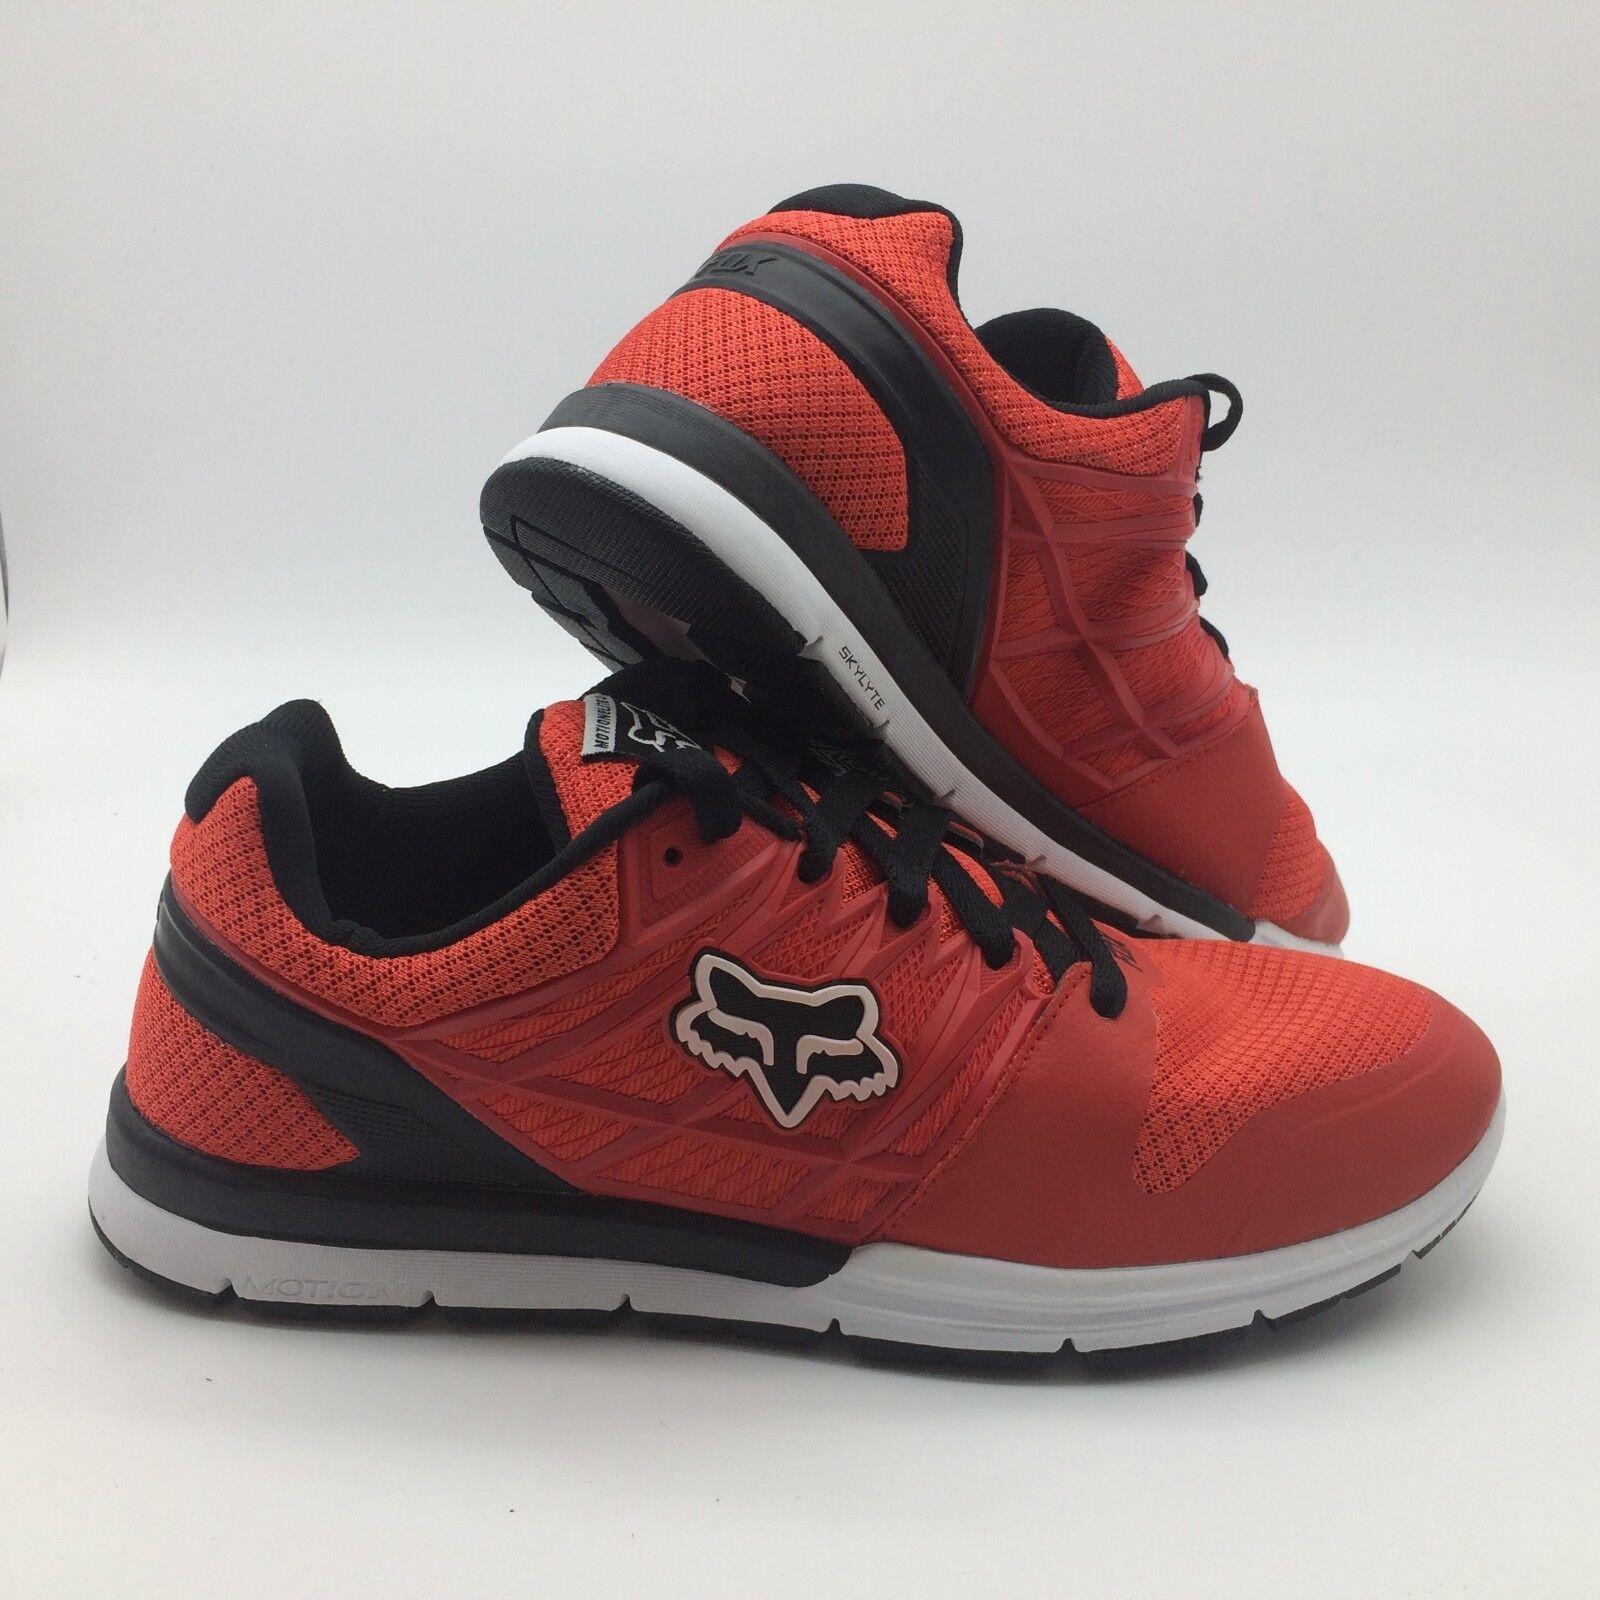 Fox men shoes   Motion Elite Ll   red black Bianco